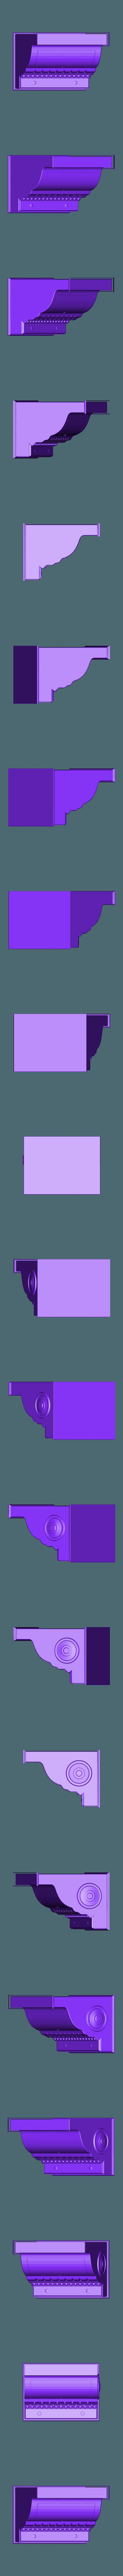 CASH-REG.stl Download free STL file Cash register • Model to 3D print, pumpkinhead3d